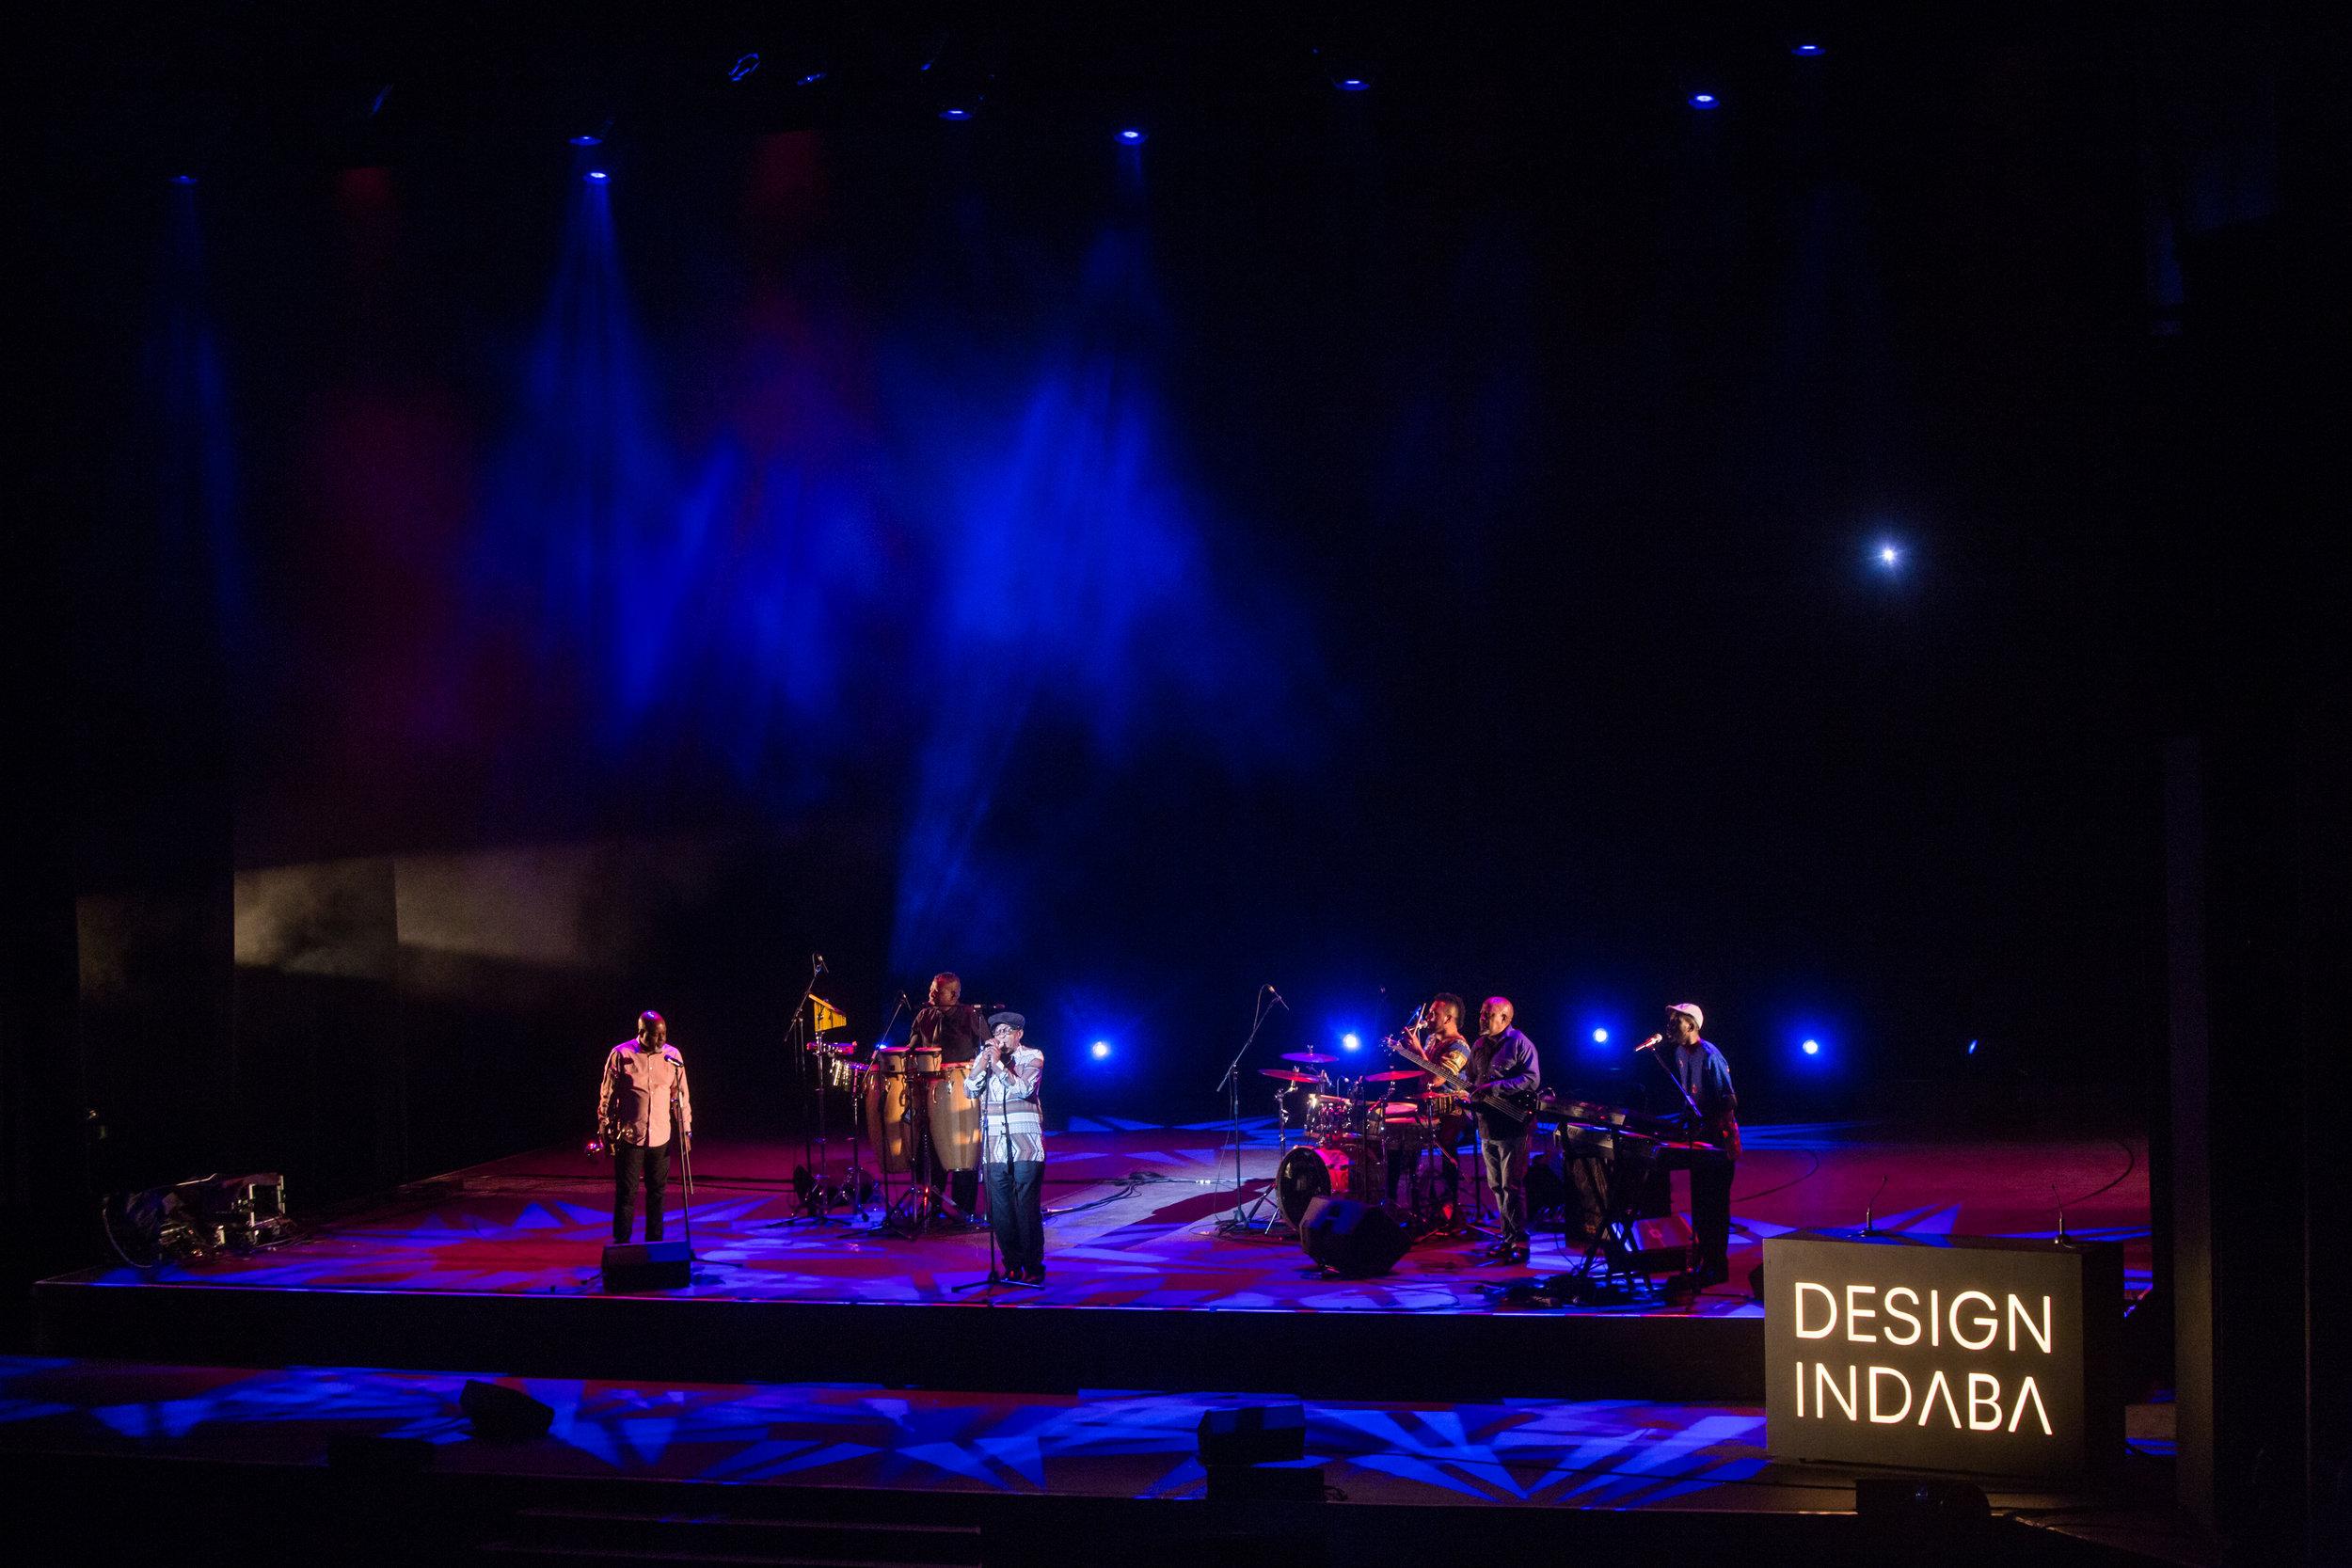 DesignIndaba - Hugh_Masekela_Tribute_2018 - Priyah Pillay.jpg